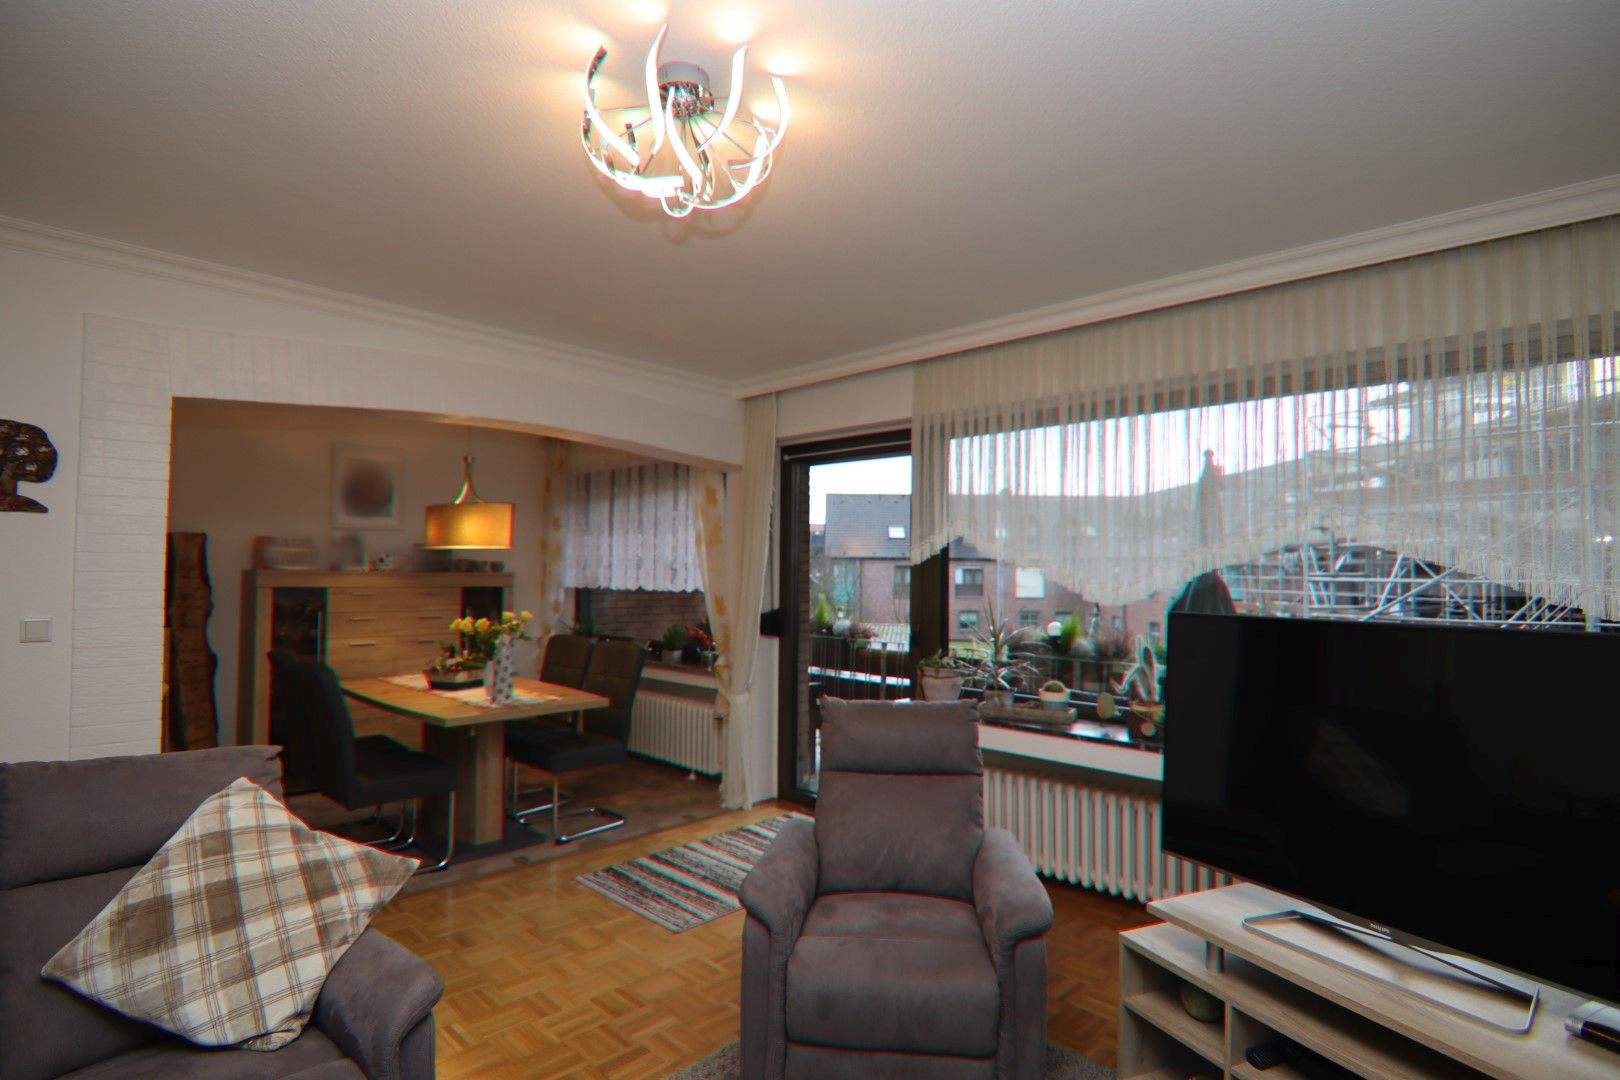 Immobilie Nr.0221 | Hauptstraße 60, 40668 Meerbusch Lank